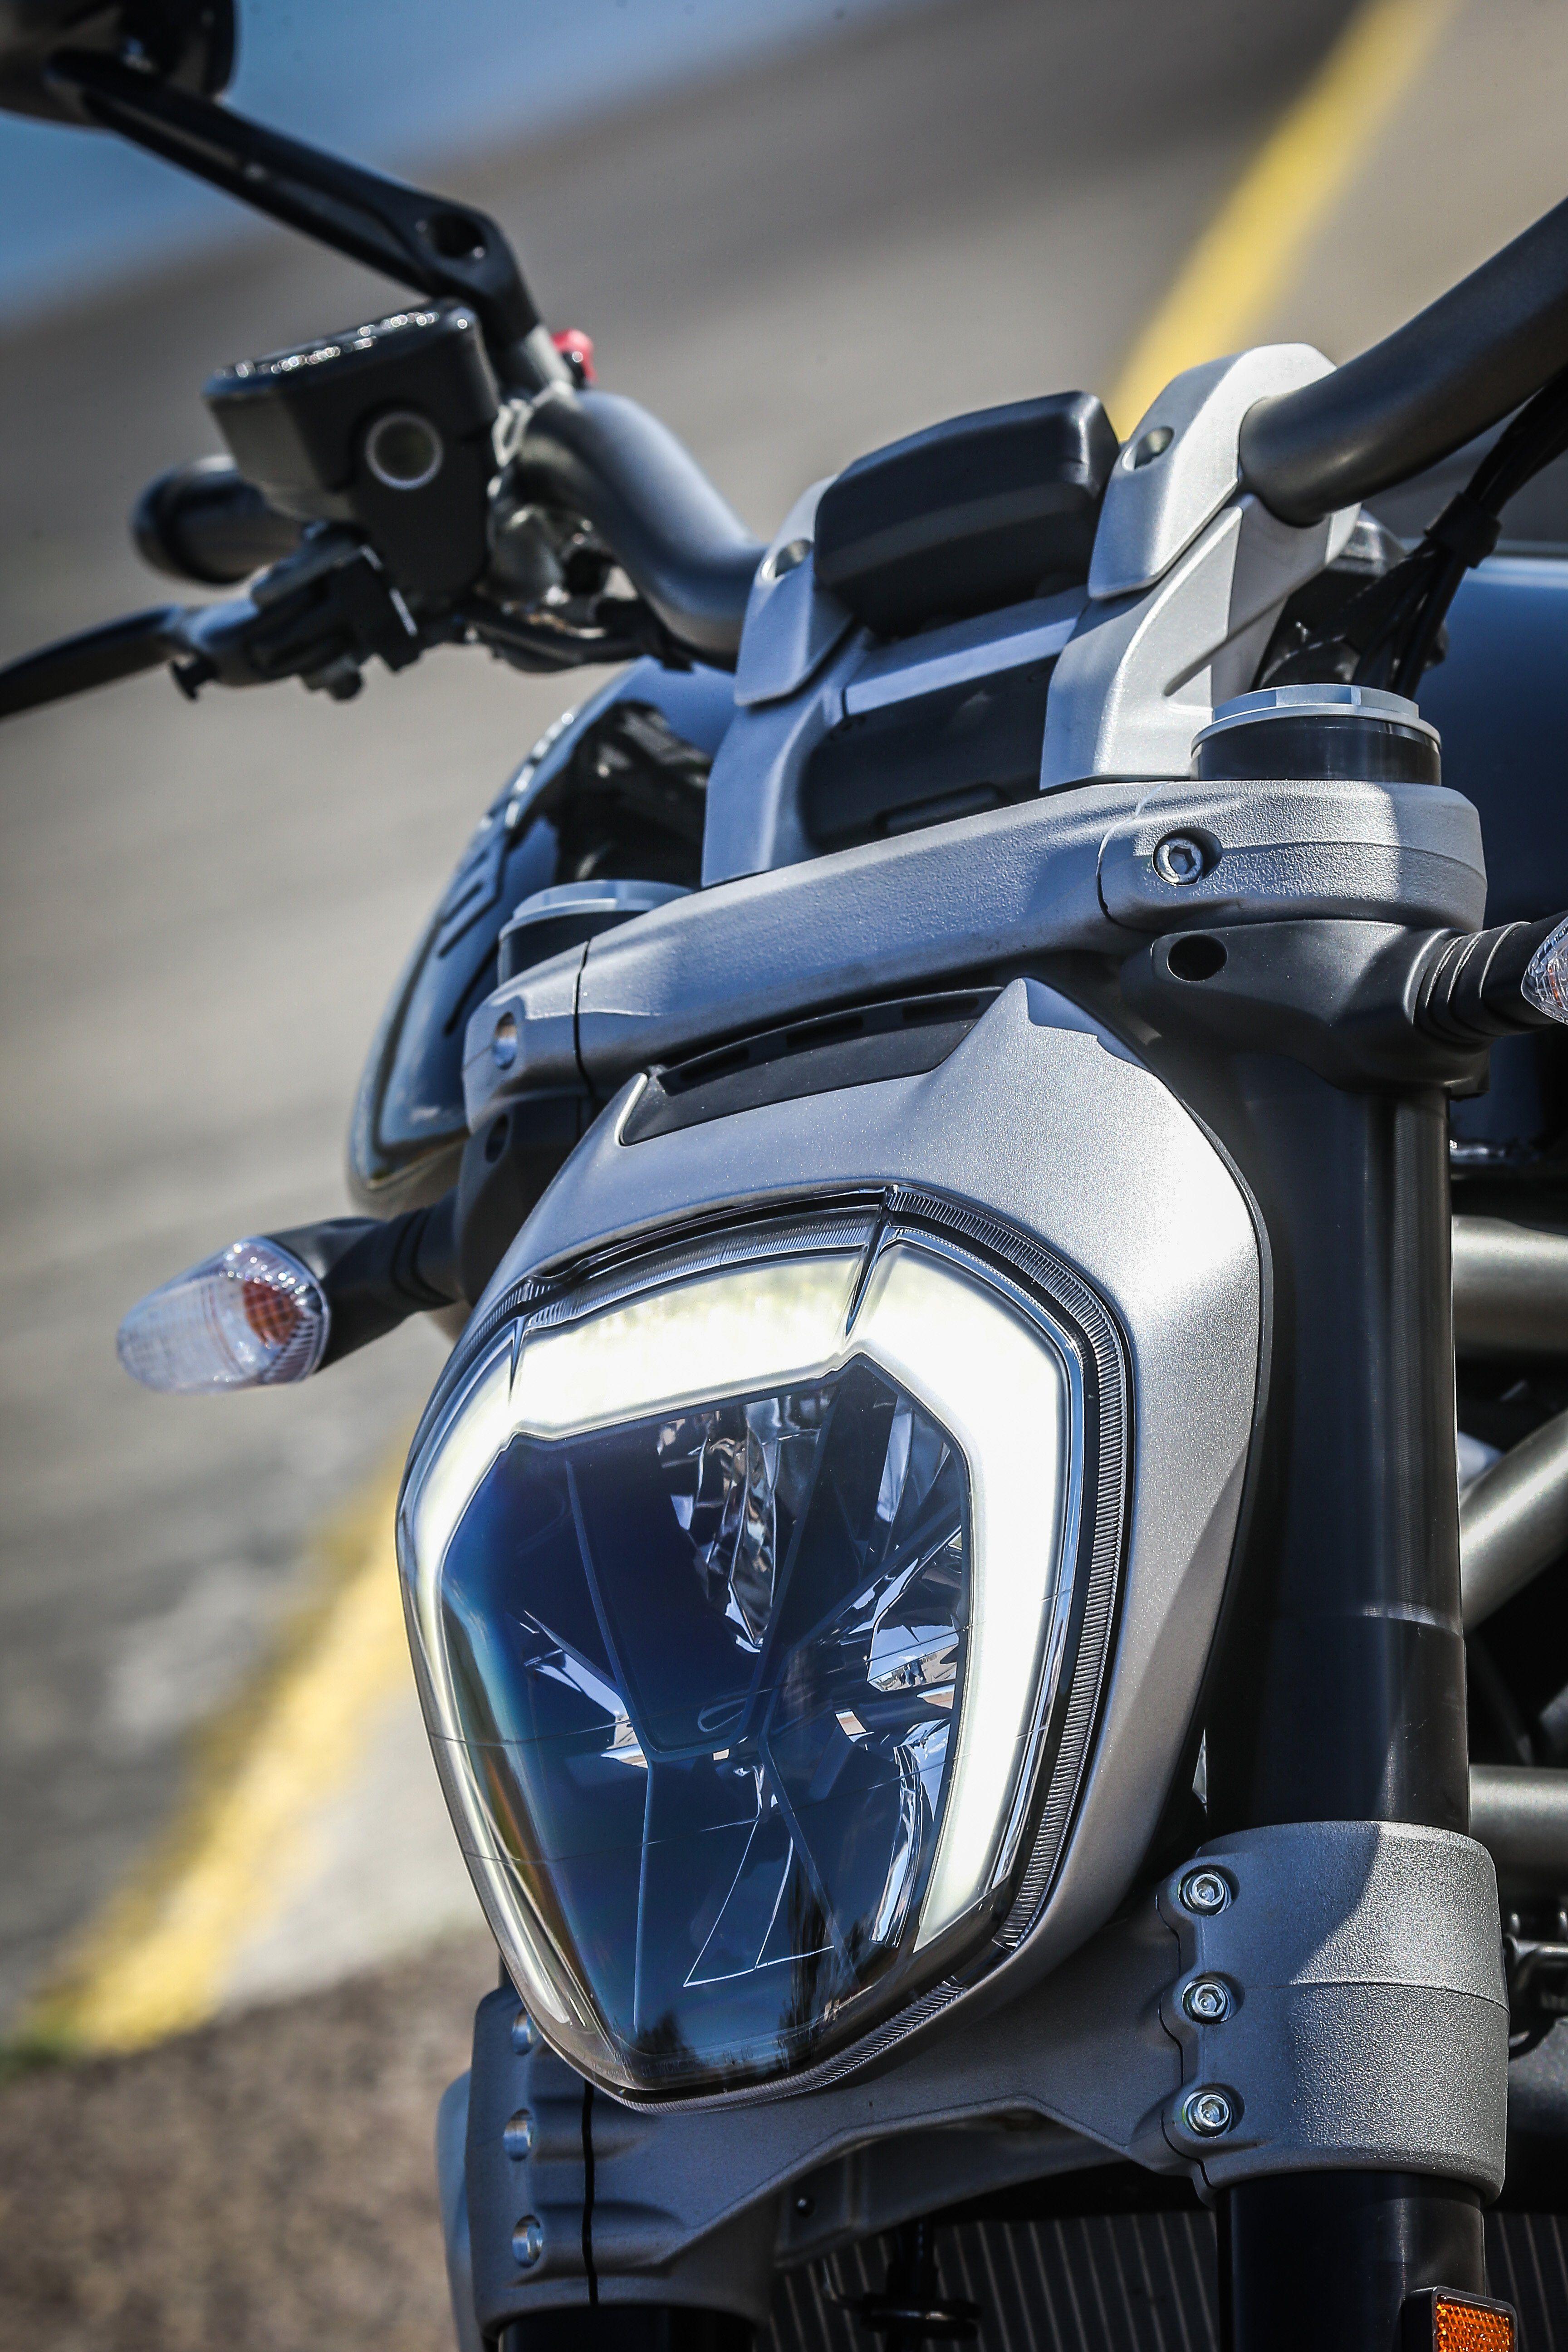 2016-Ducati-XDiavel-detail-21.jpg (3456×5184) | CAR ... for Motorcycle Headlight Design  585hul